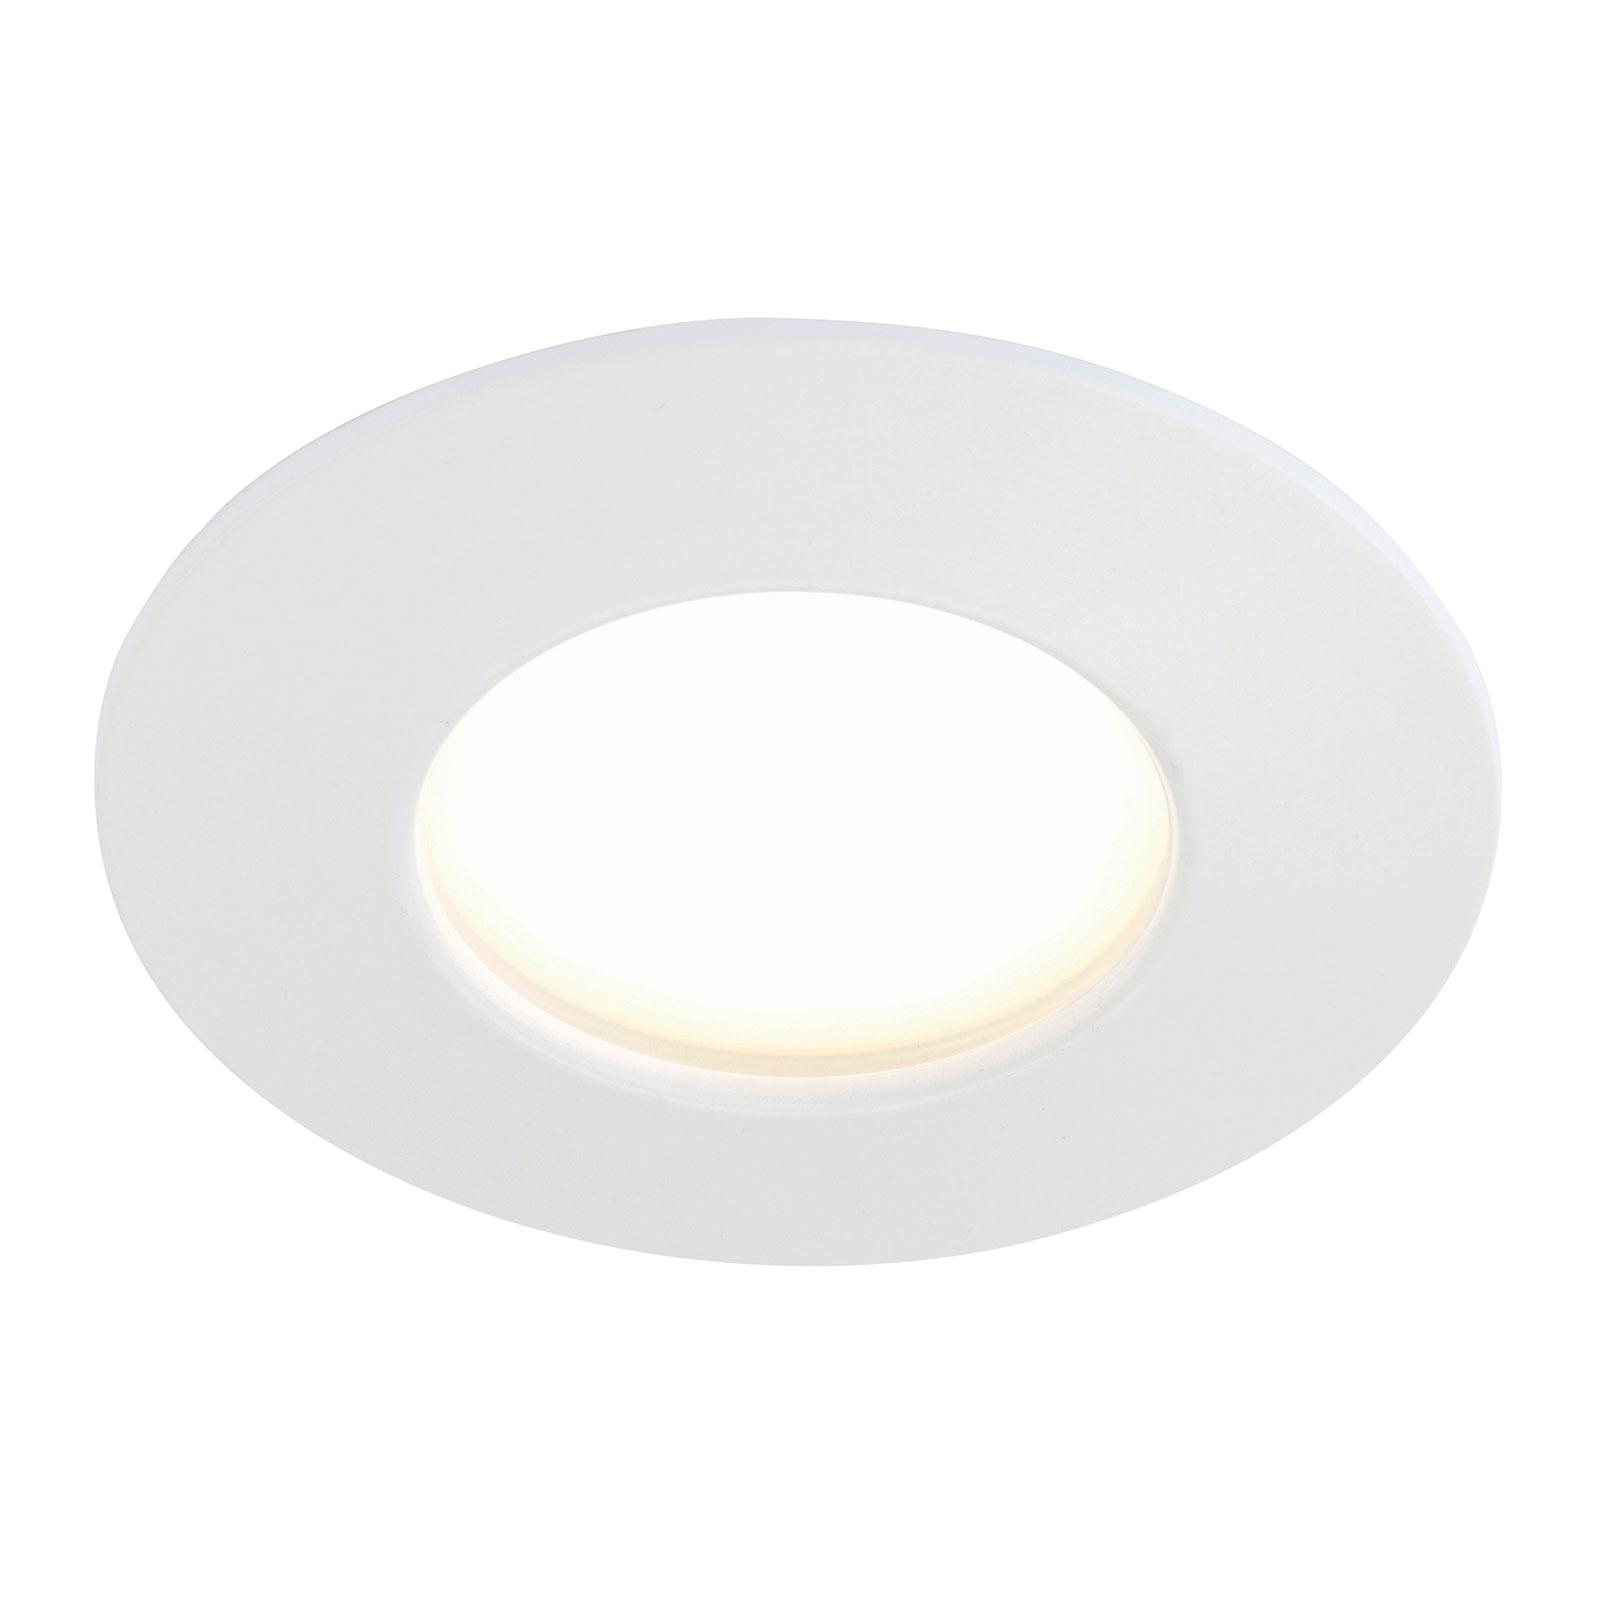 Witte LED inbouwlamp Felia, IP44